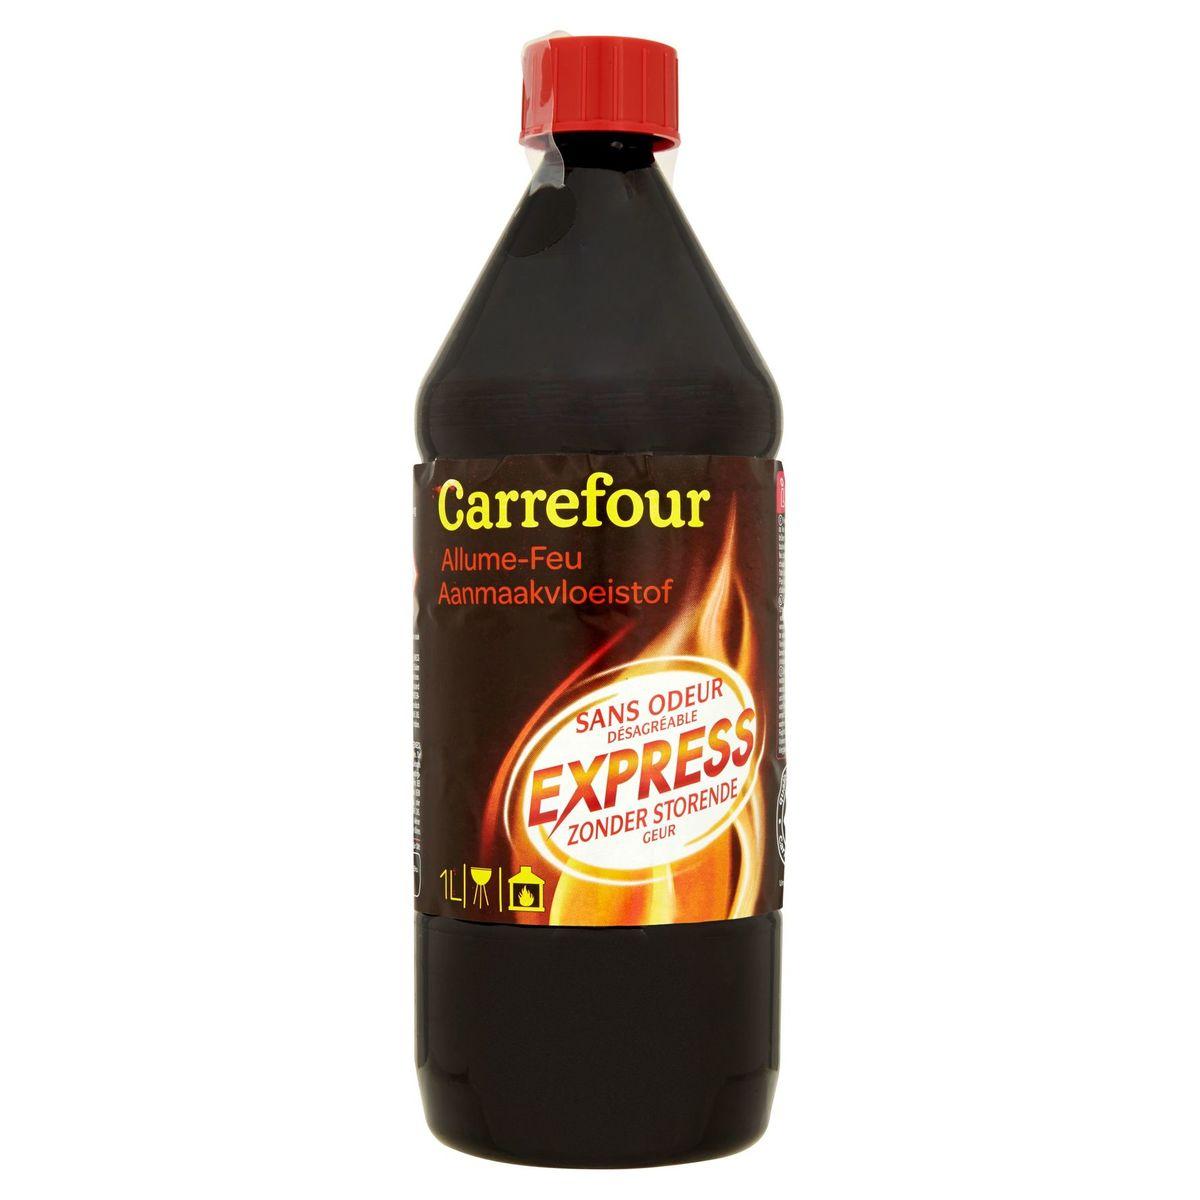 Carrefour Aanmaakvloeistof Express 1 L